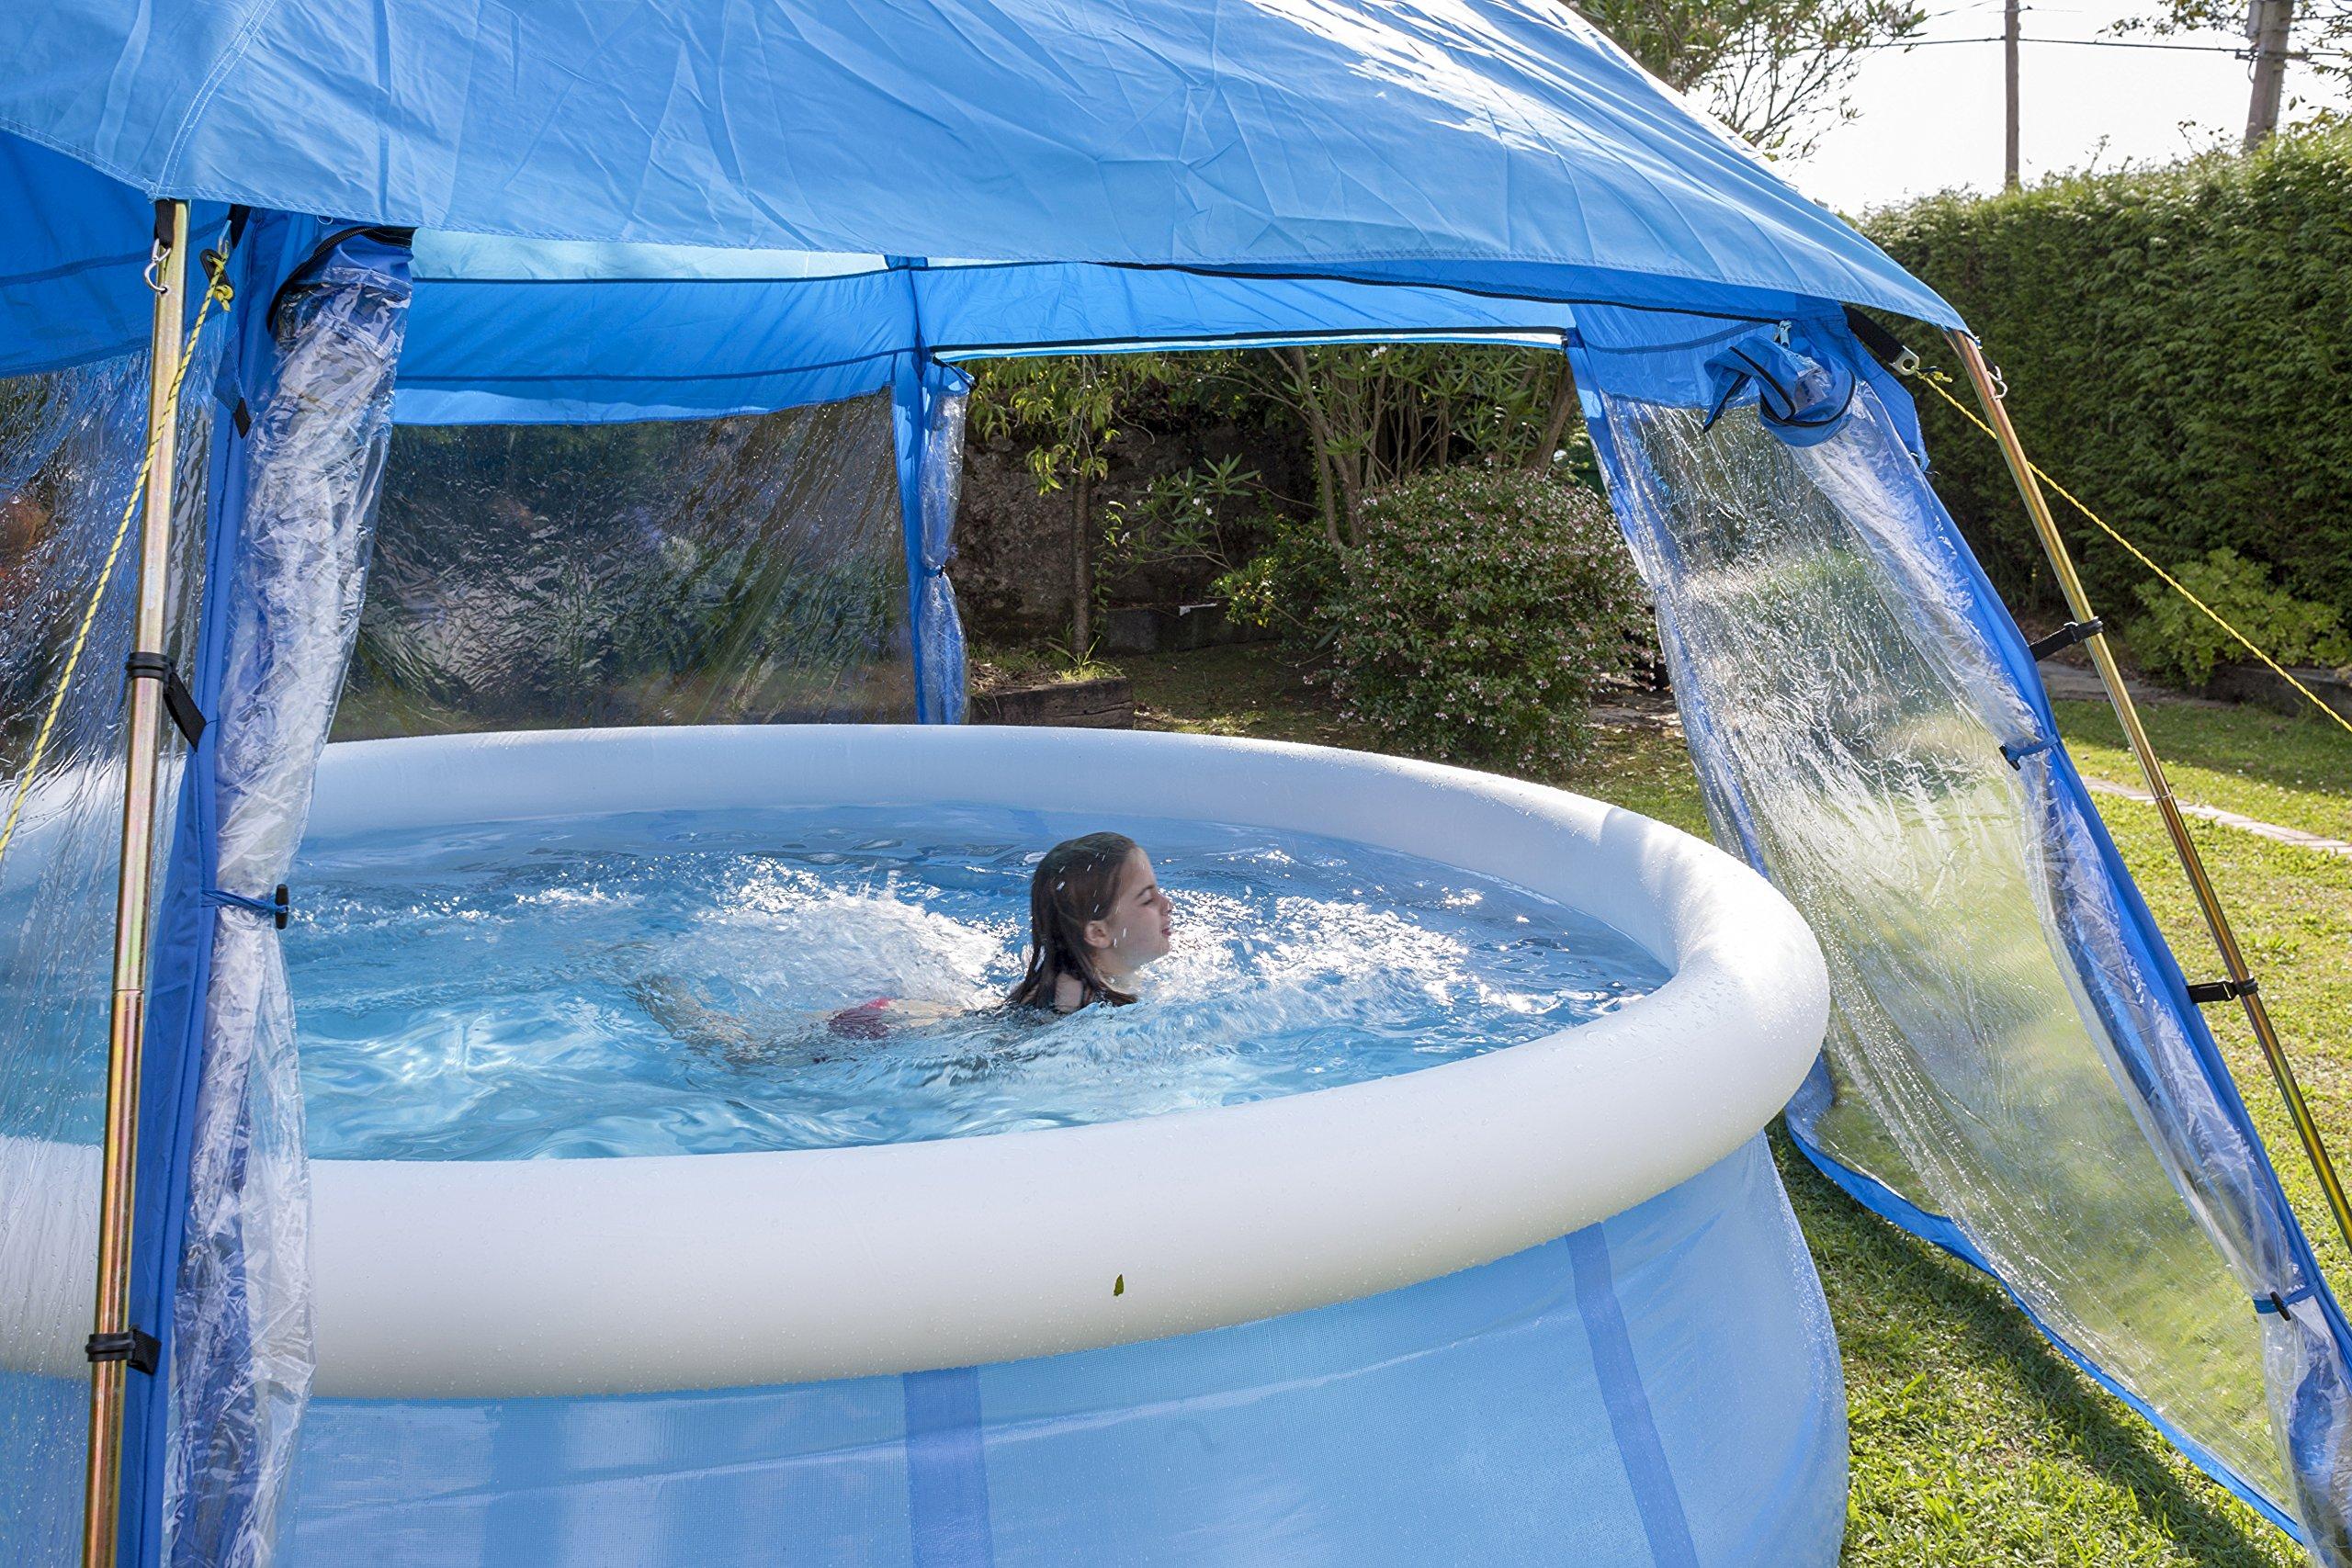 Gre PH54 Pool House - Toldo para Piscina: Amazon.es: Jardín